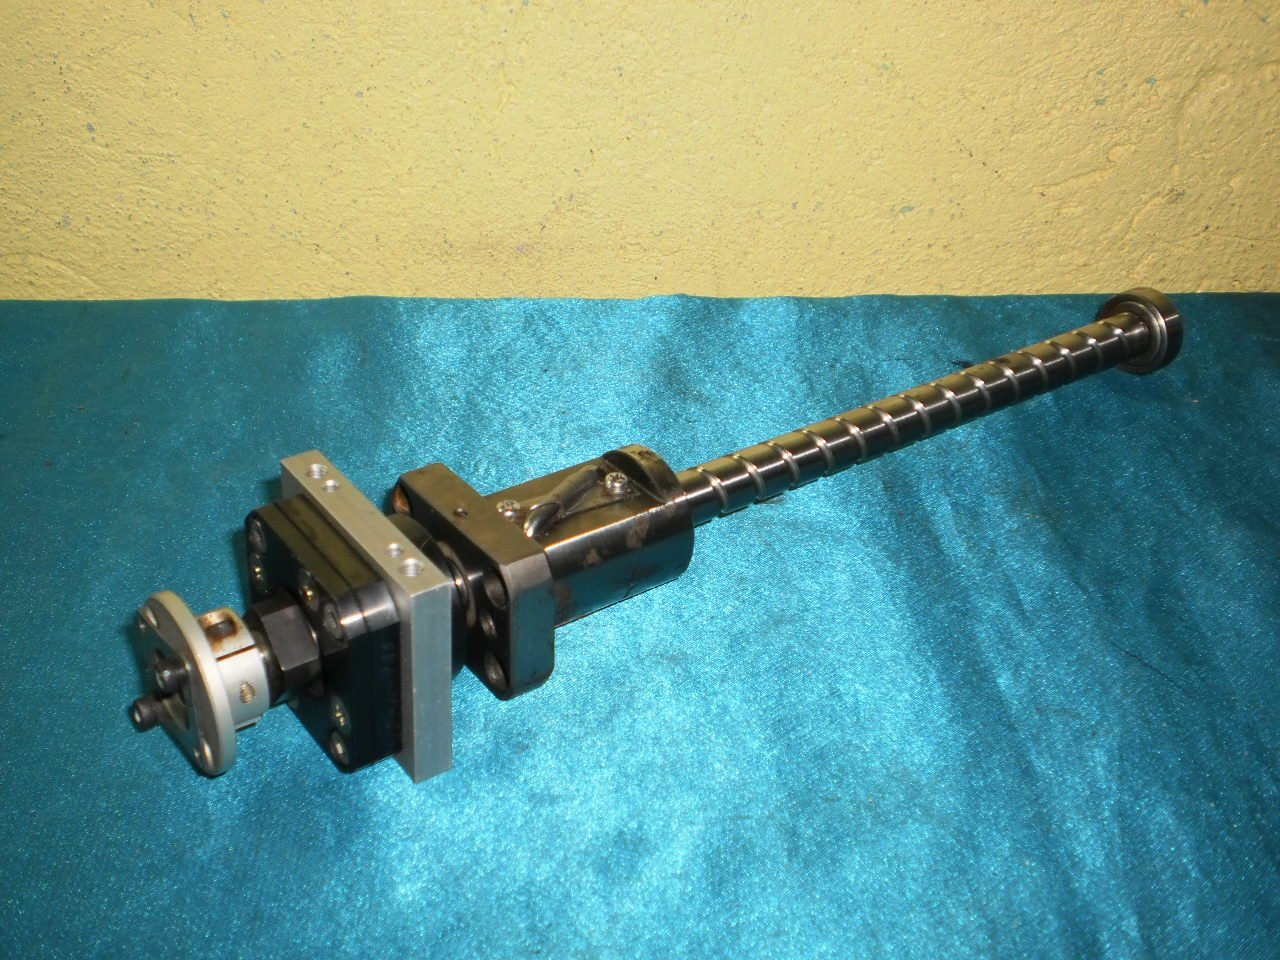 NSK W1202FA-6-C5T 28cm Lead Screw